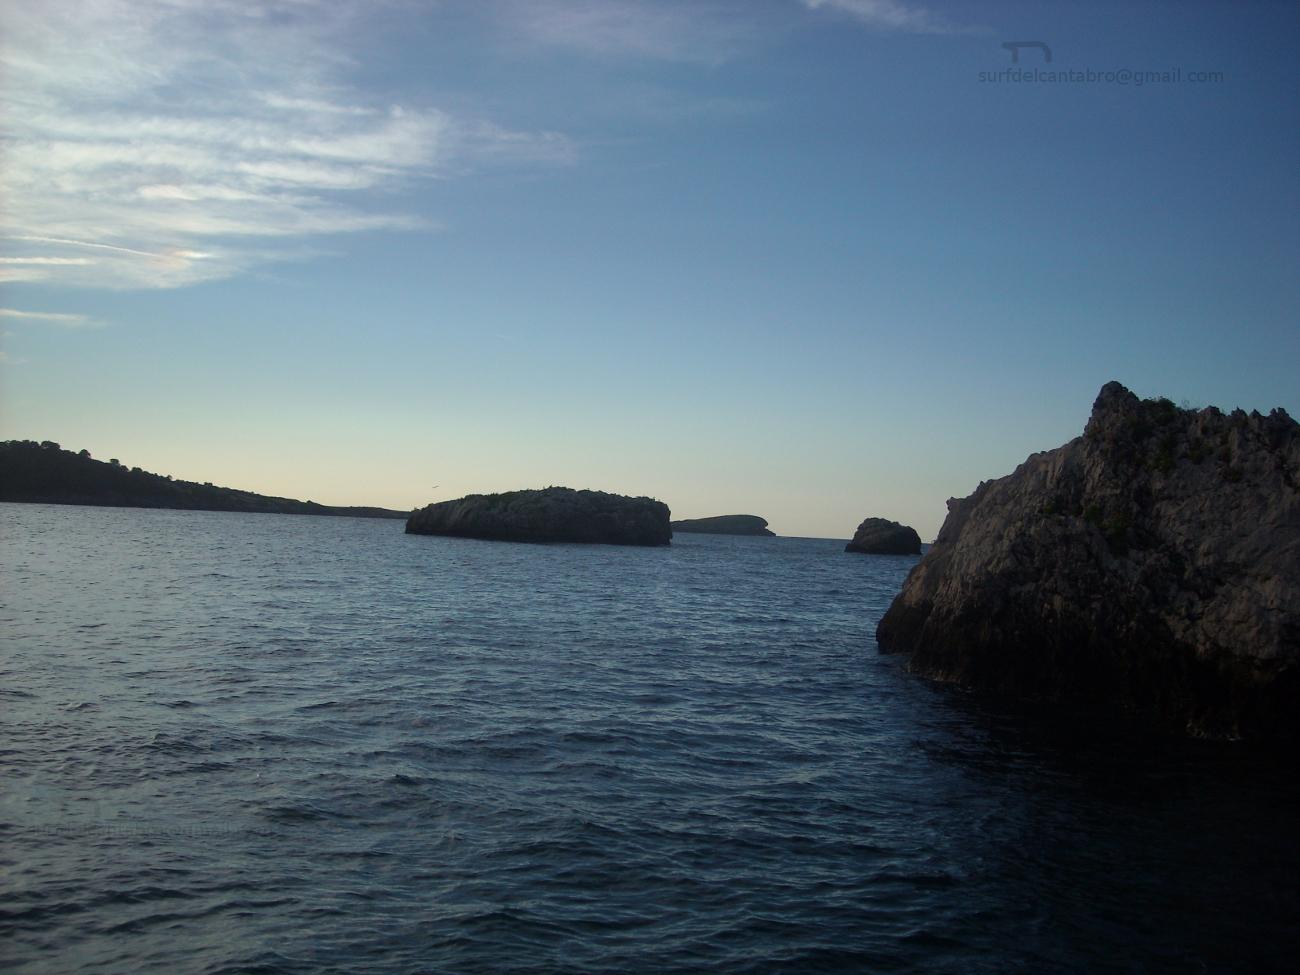 Rocks & Islands